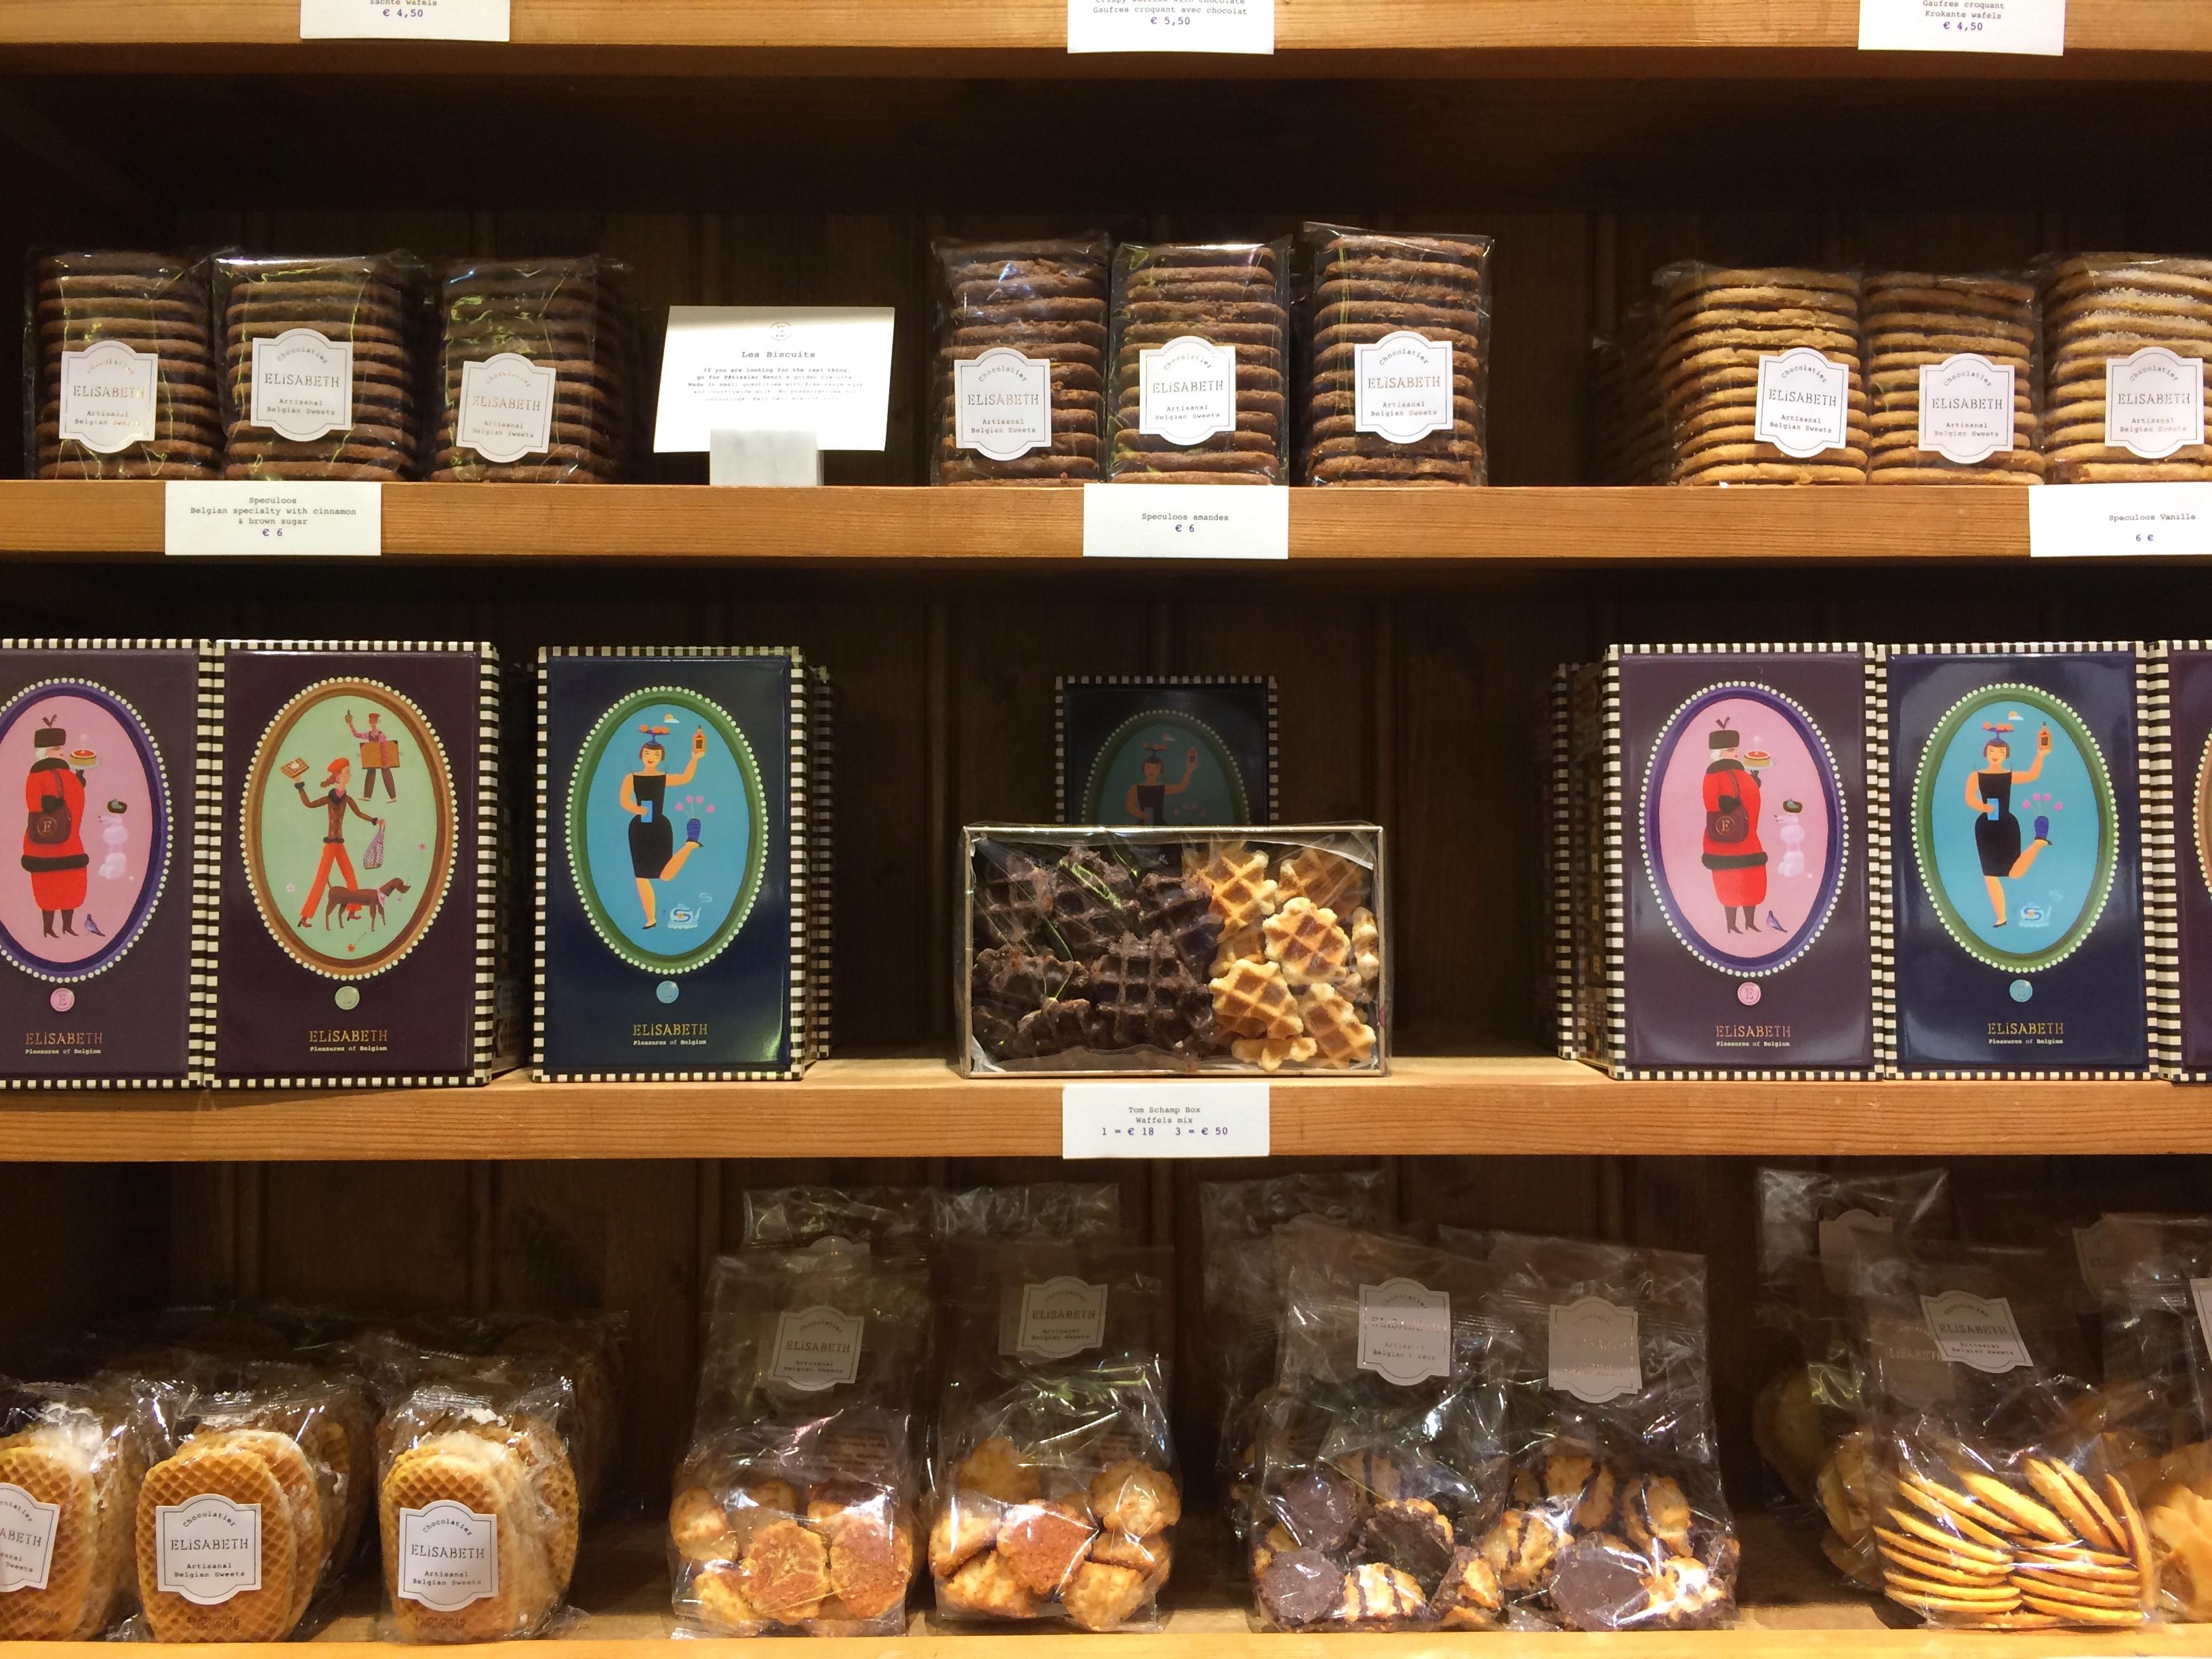 chocolats-elisabeth-bruxelles